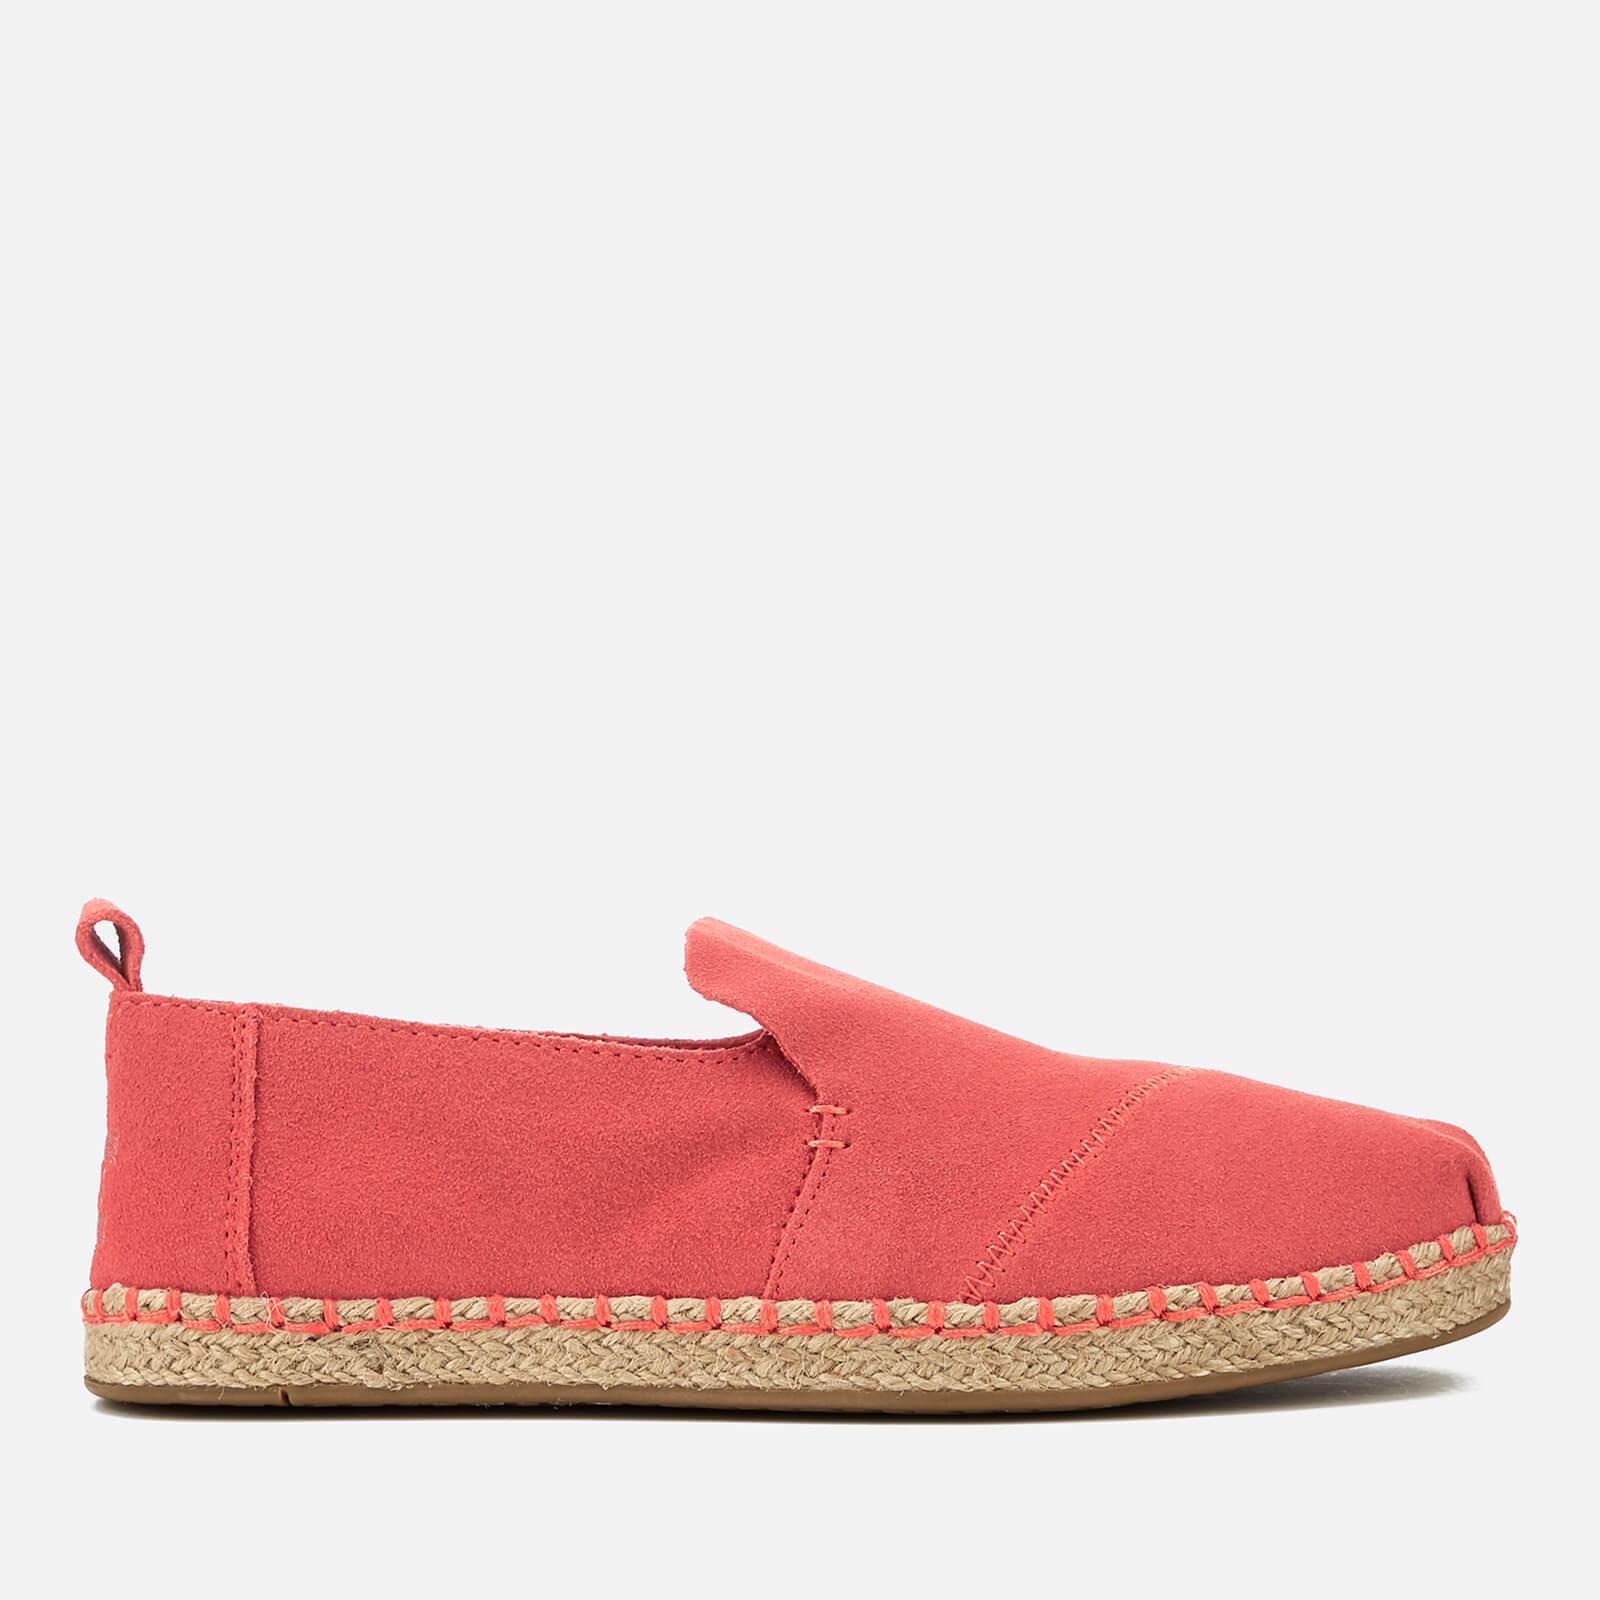 7640a3dab30 TOMS Women s Deconstructed Suede Alpargata Espadrilles - Hibiscous Womens  Footwear